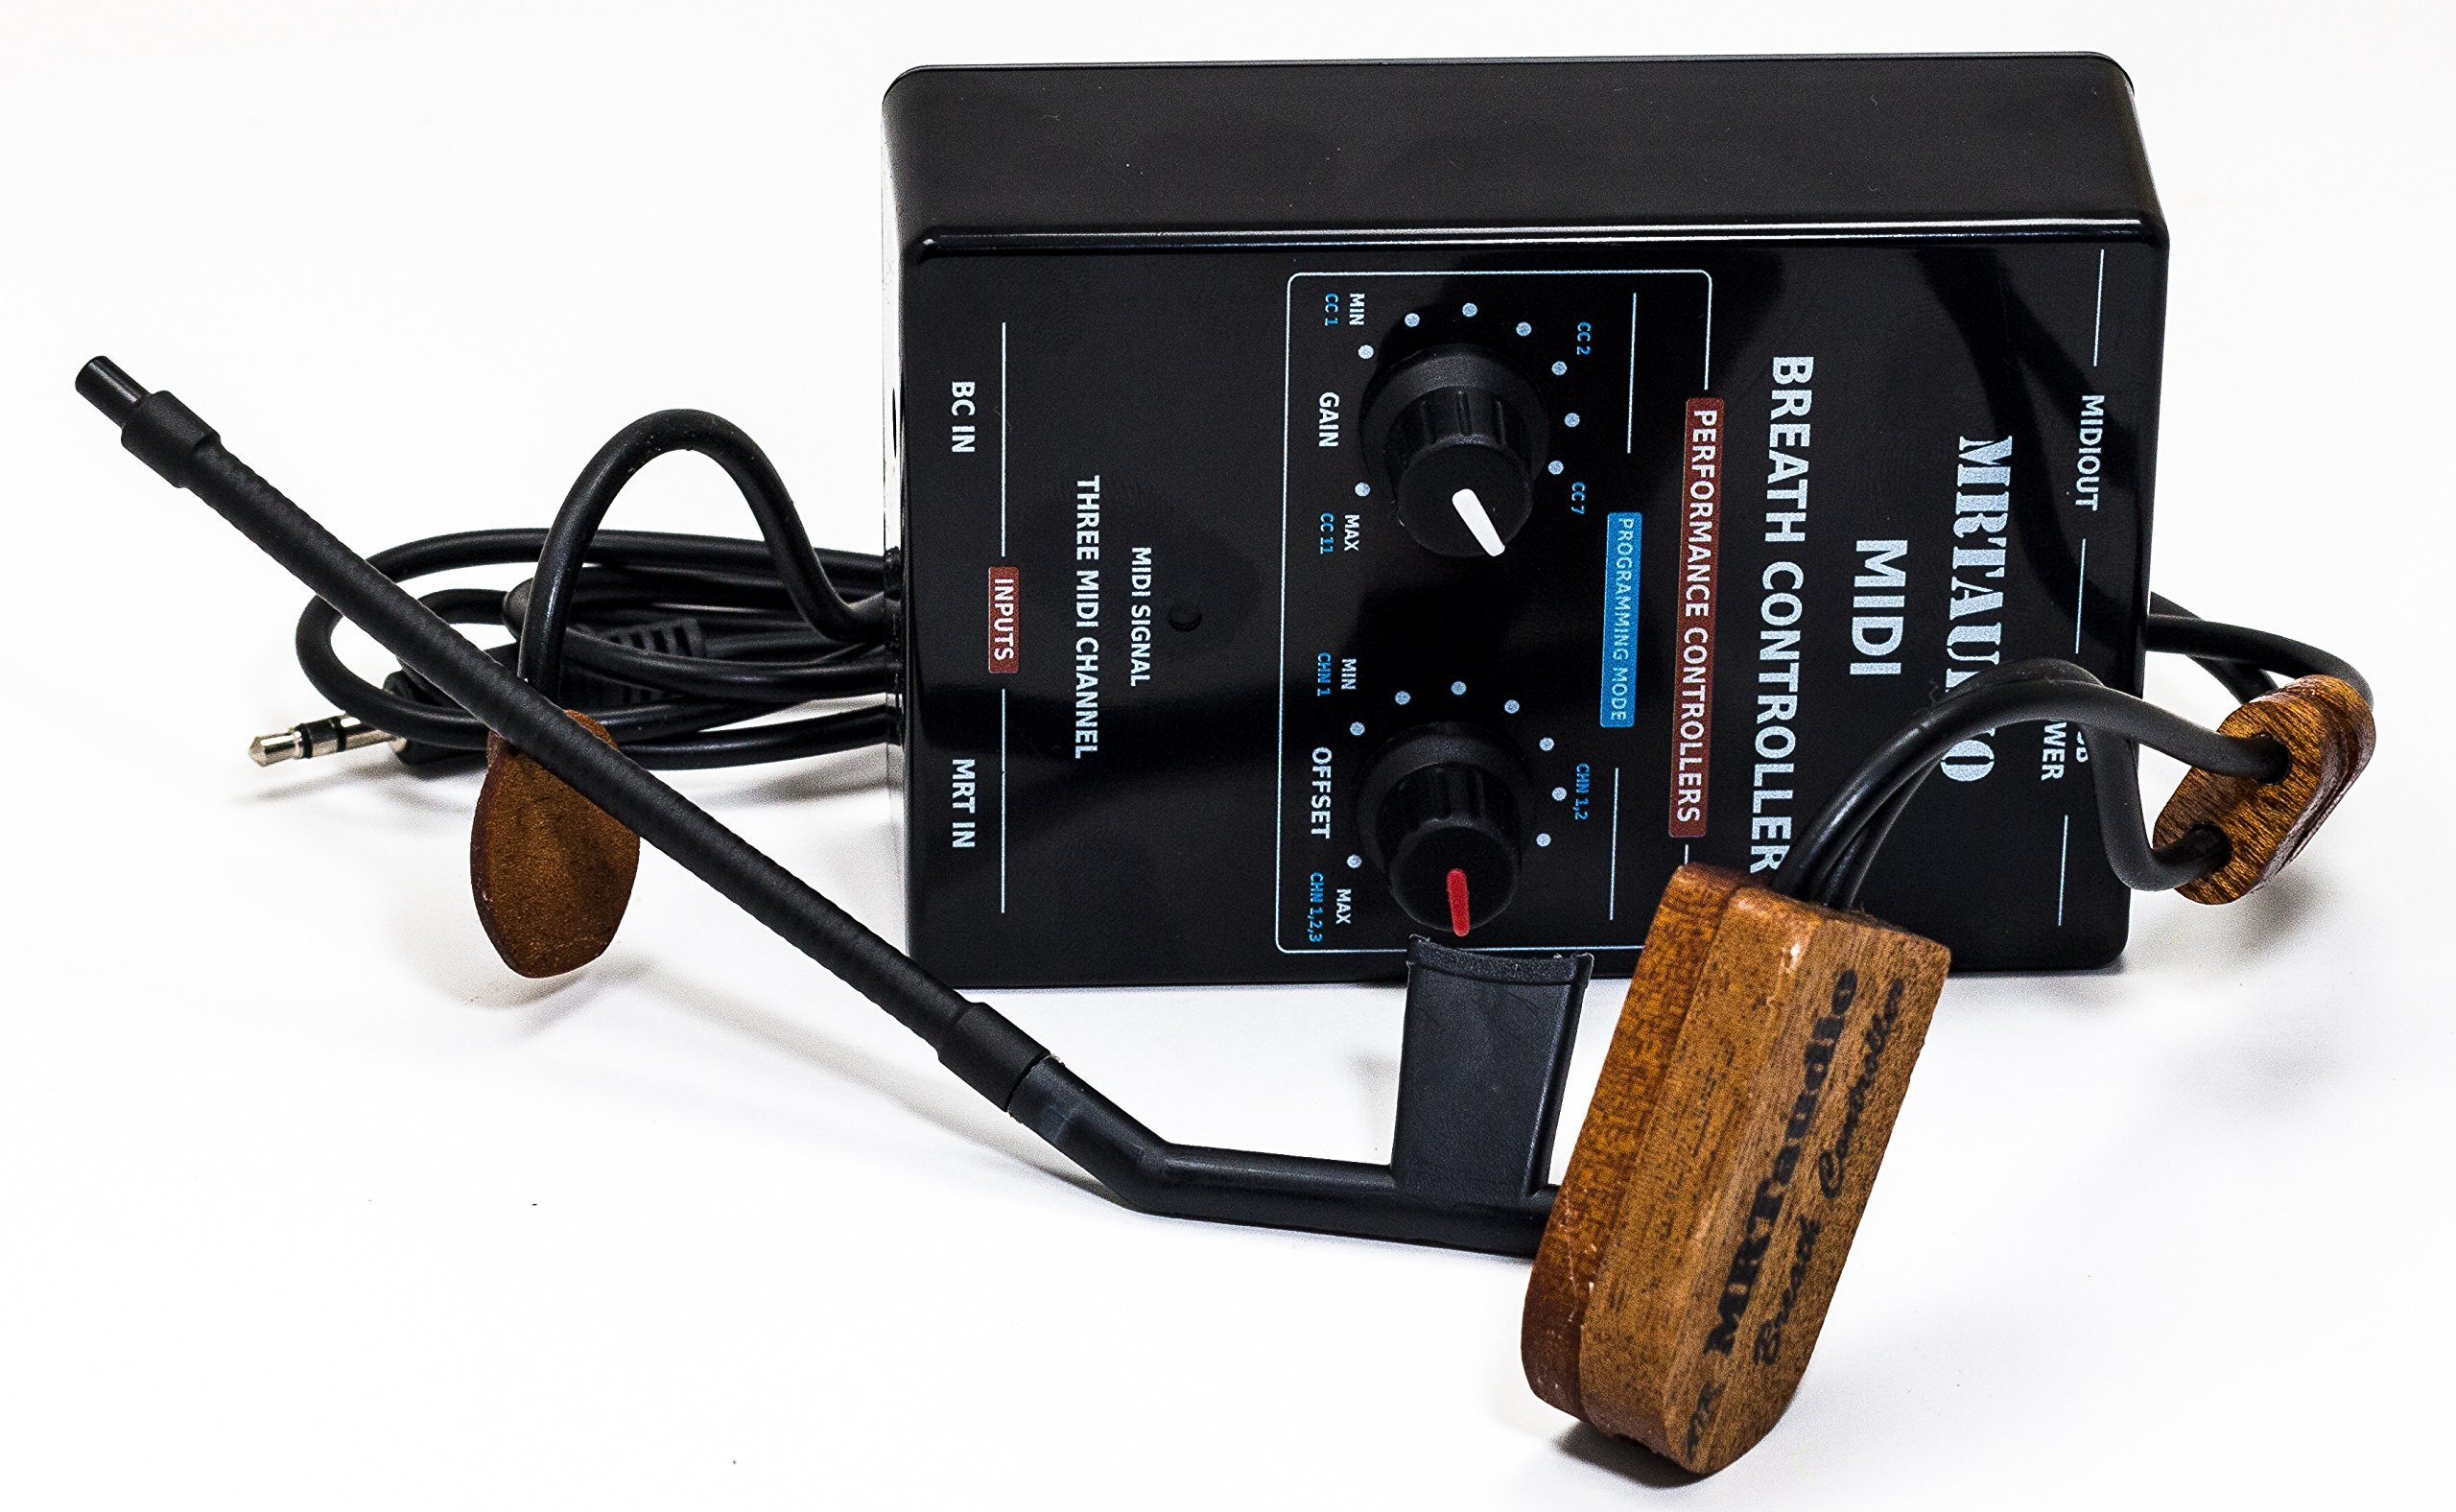 Mrtaudio Midi Breath Controller v2 for Yamaha bc3a by Mrtaudio (Image #3)